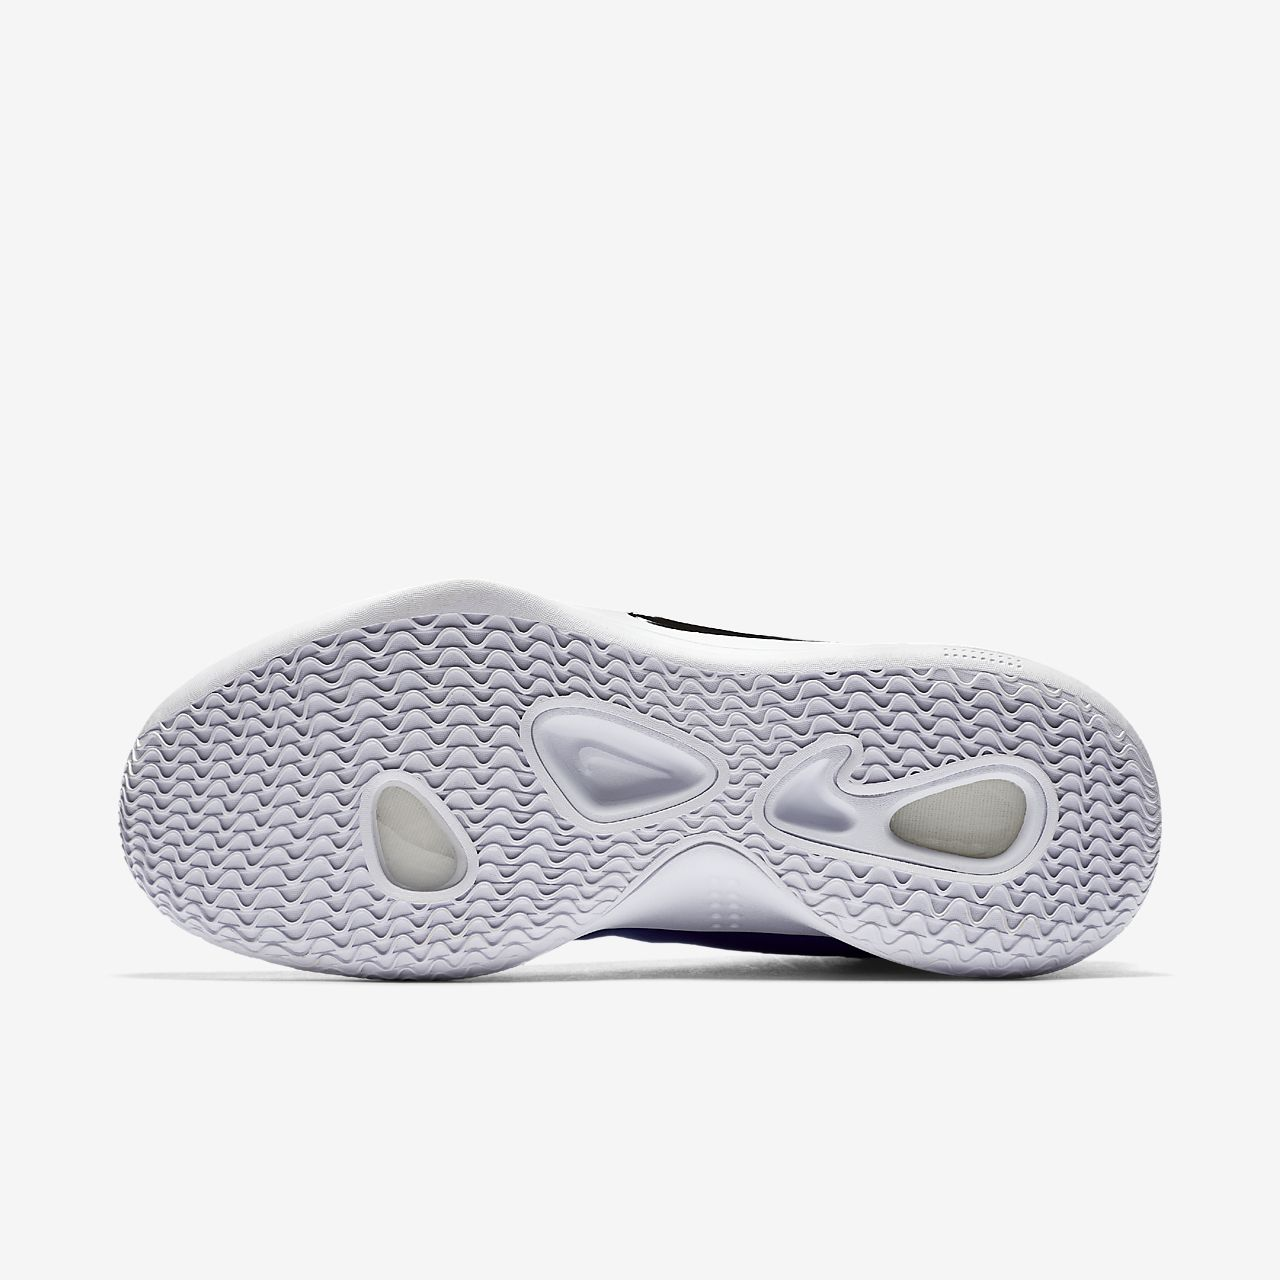 7ff08e5b14f7 Nike Hyperdunk X TB Basketball Shoe. Nike.com